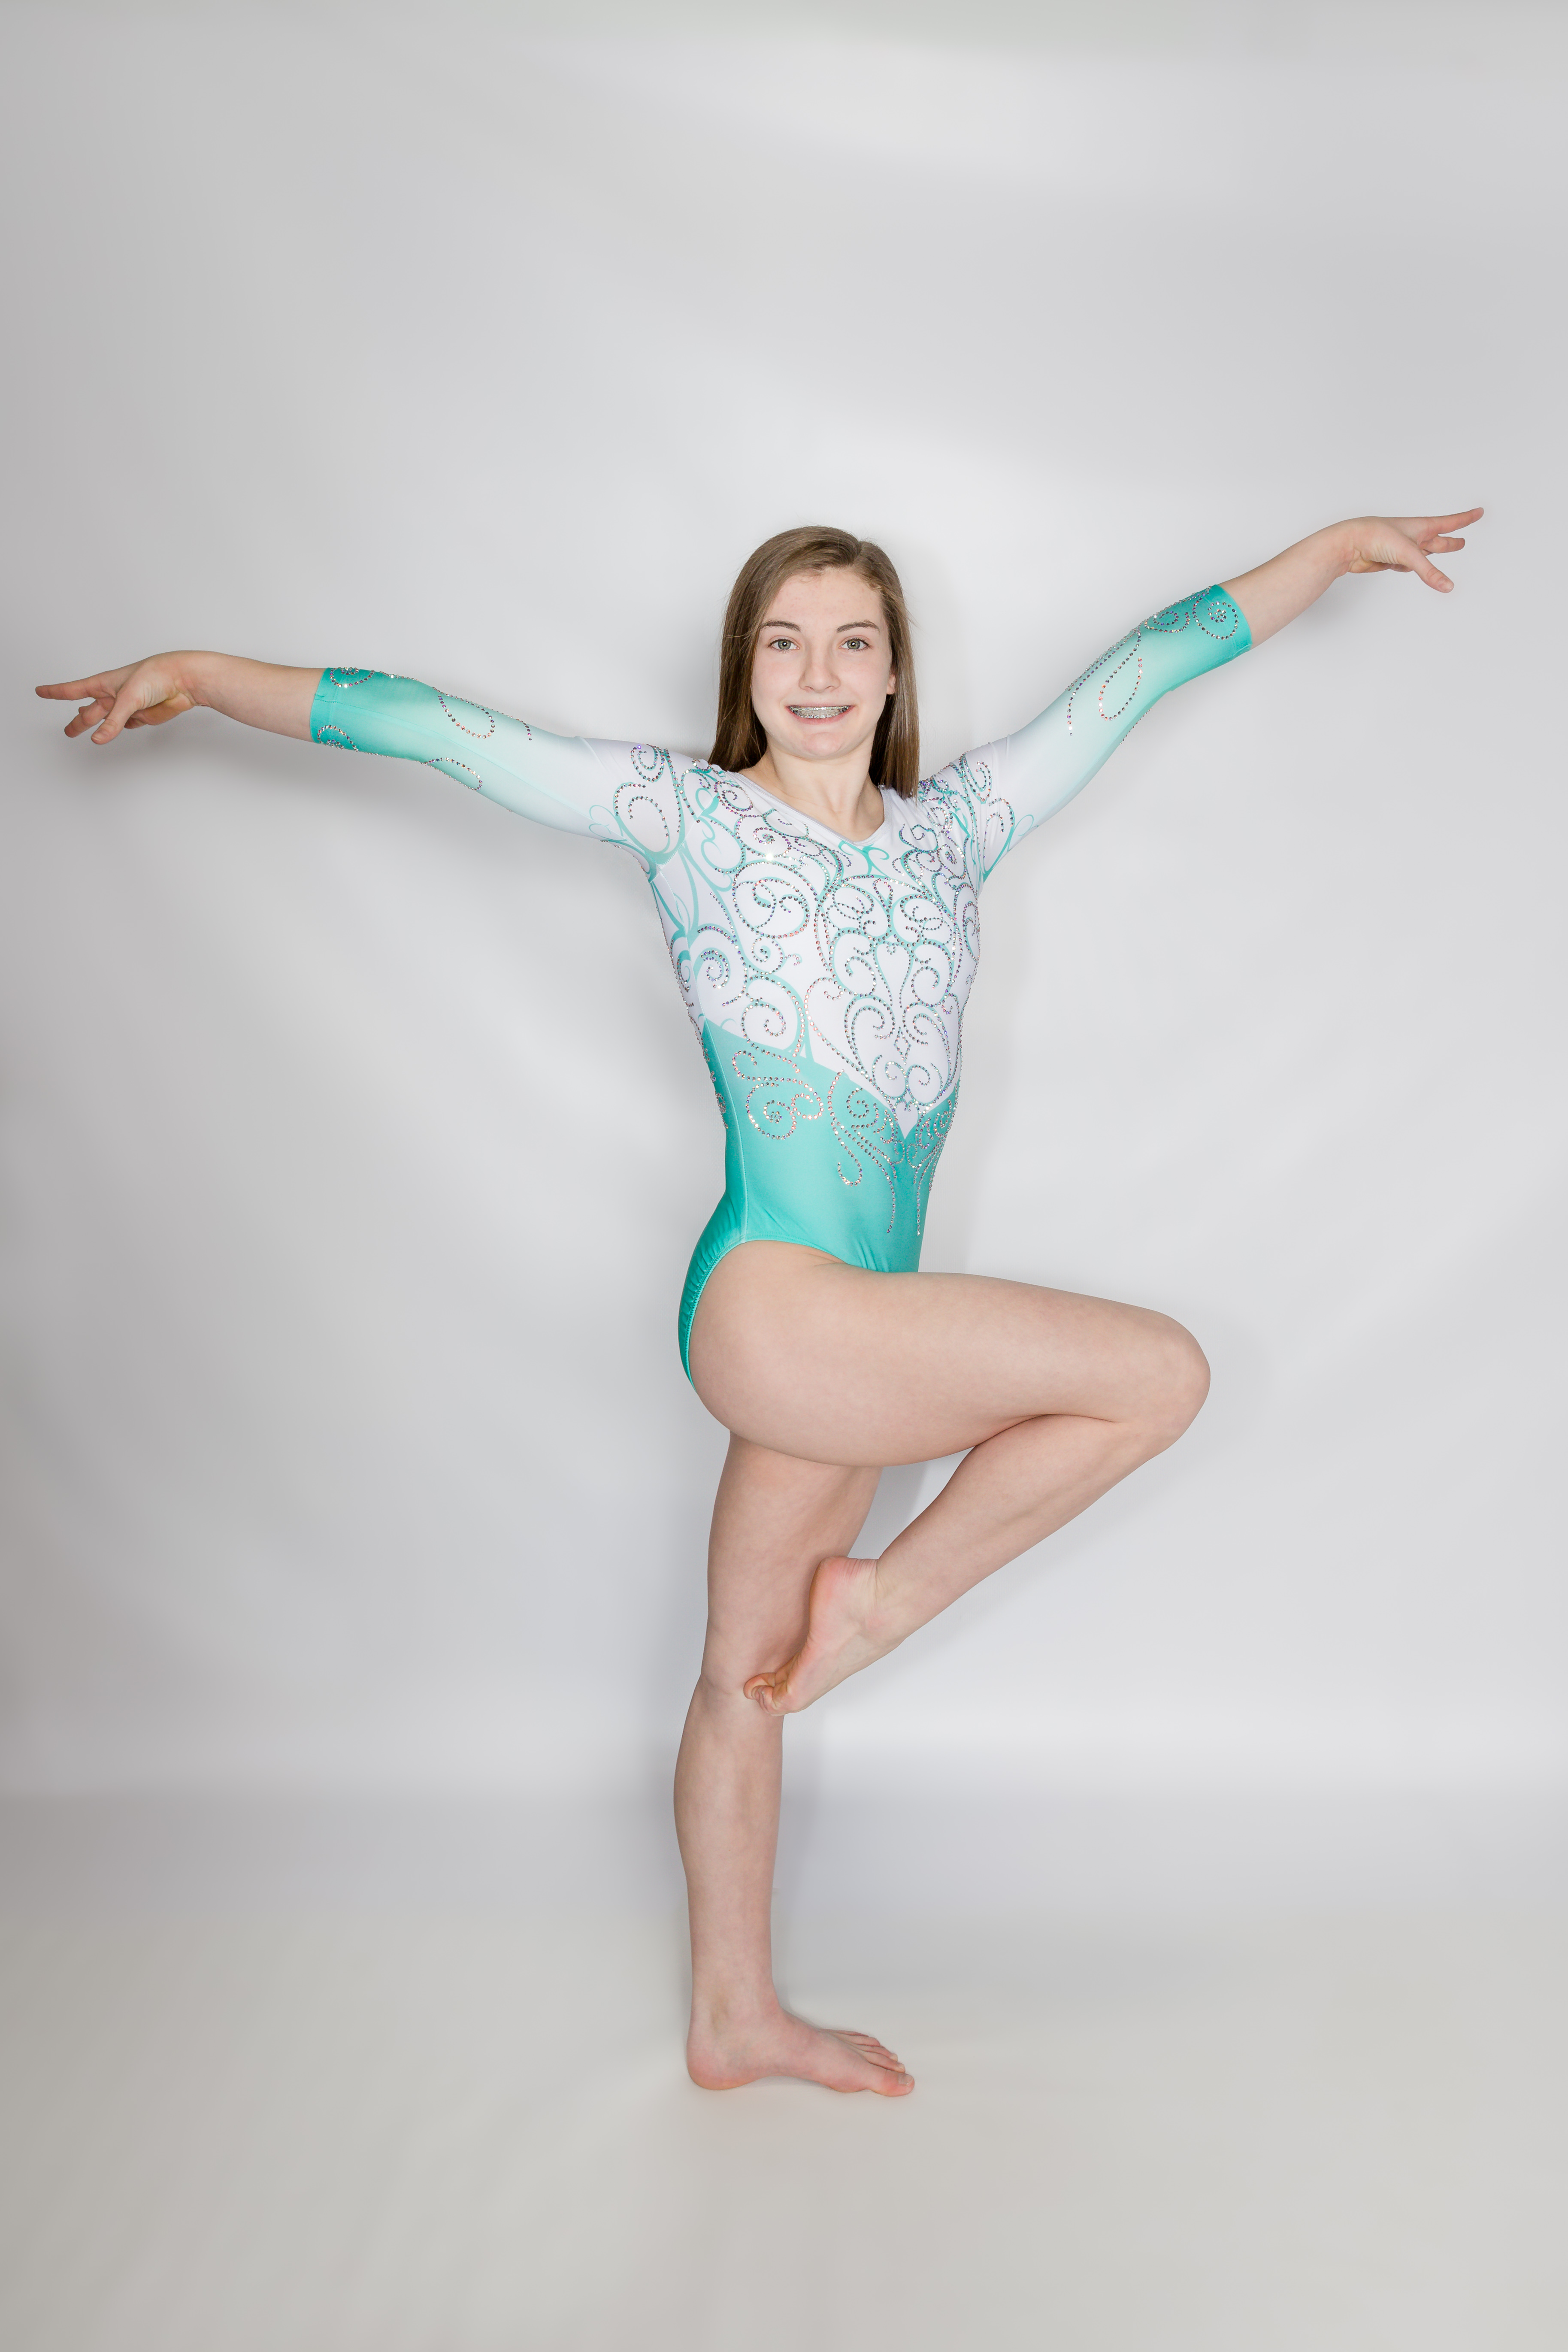 Gymnastics Pose 10